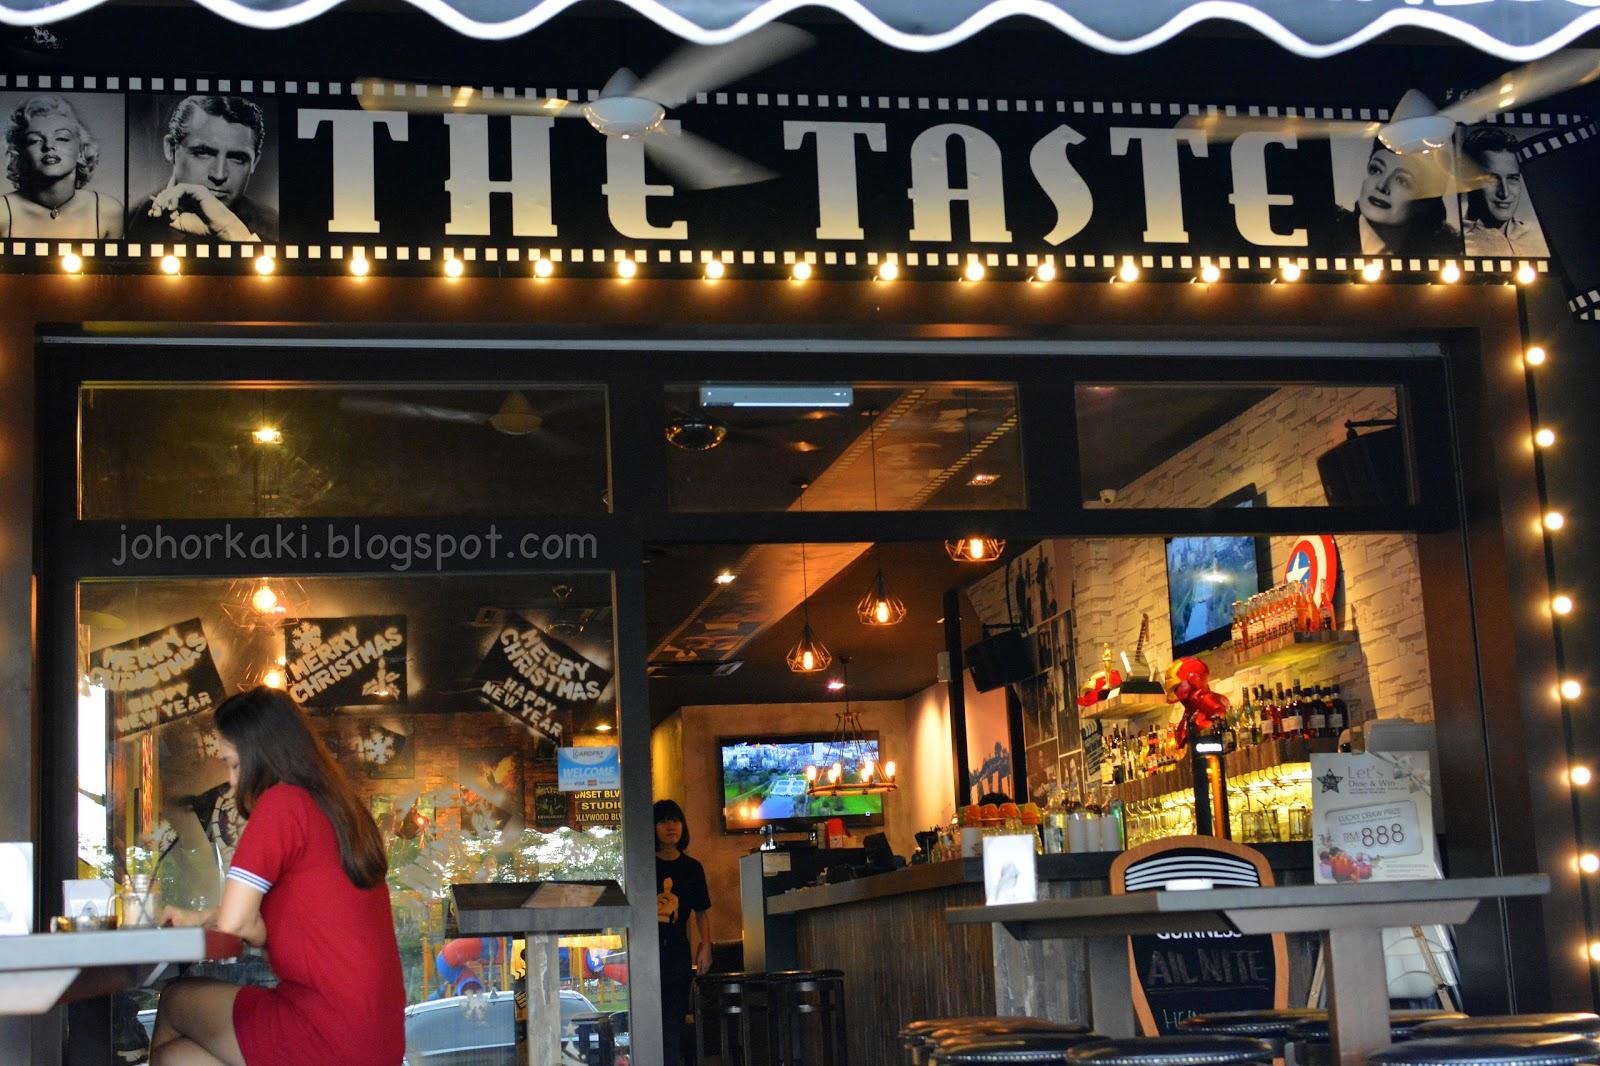 The taste restaurant johor bahru sutera skudai 新山的戏院餐厅